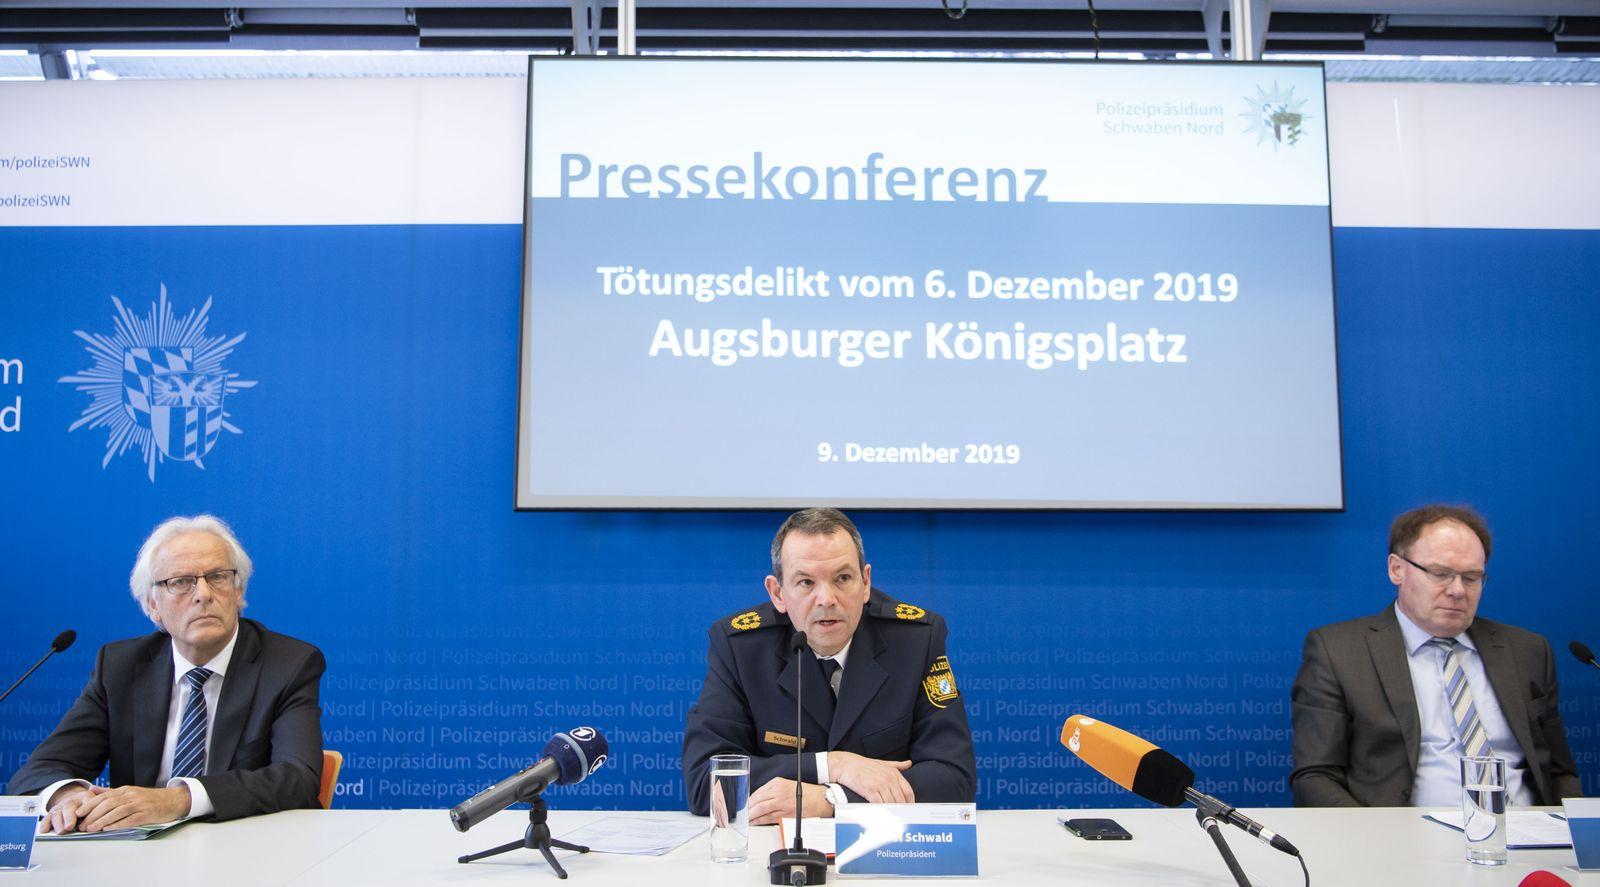 PK Augsburg